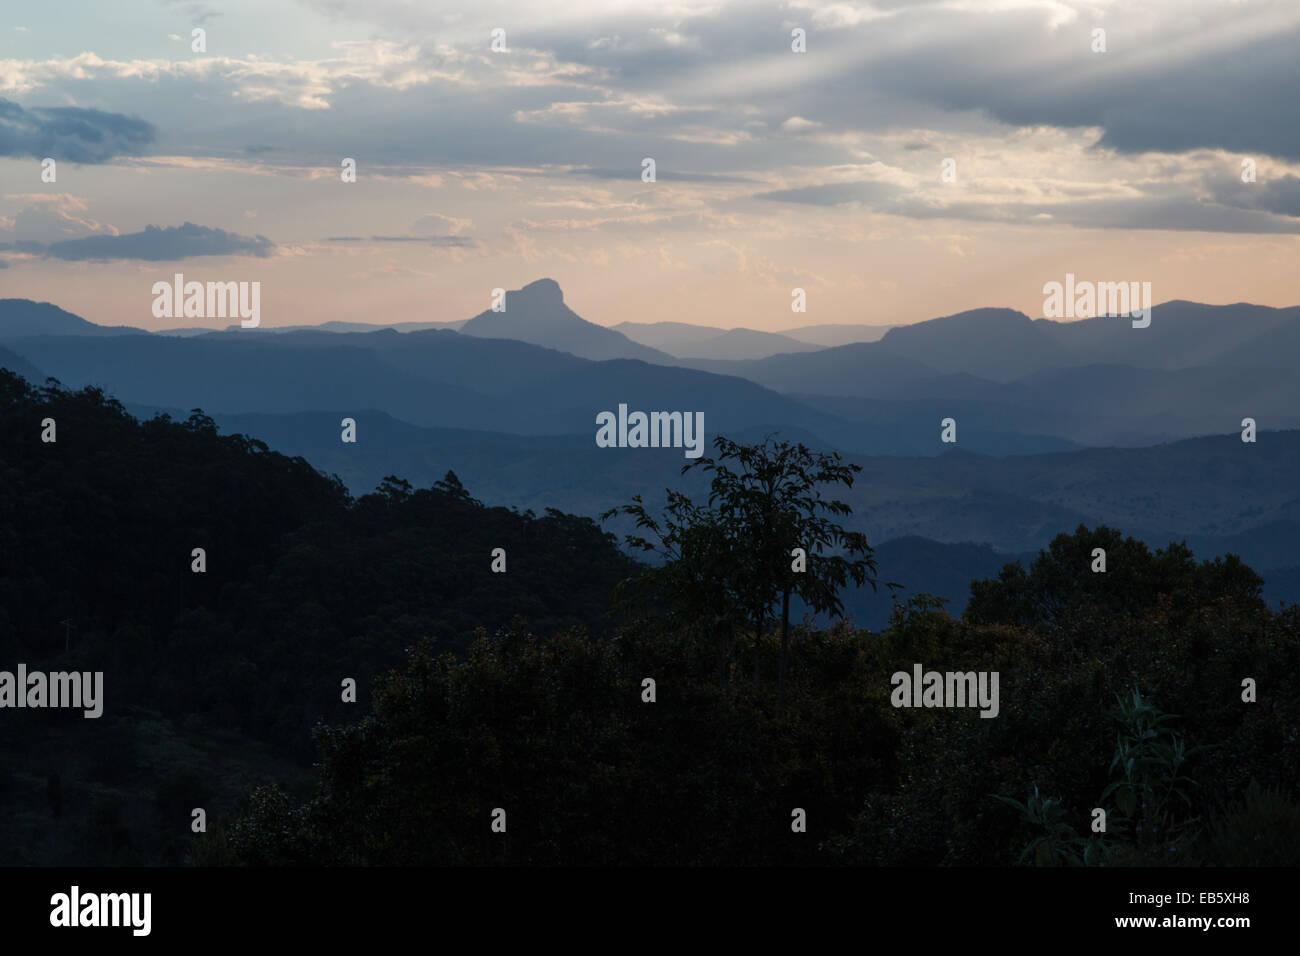 Sunset at Lamington National Park, Queensland, Australia - Stock Image